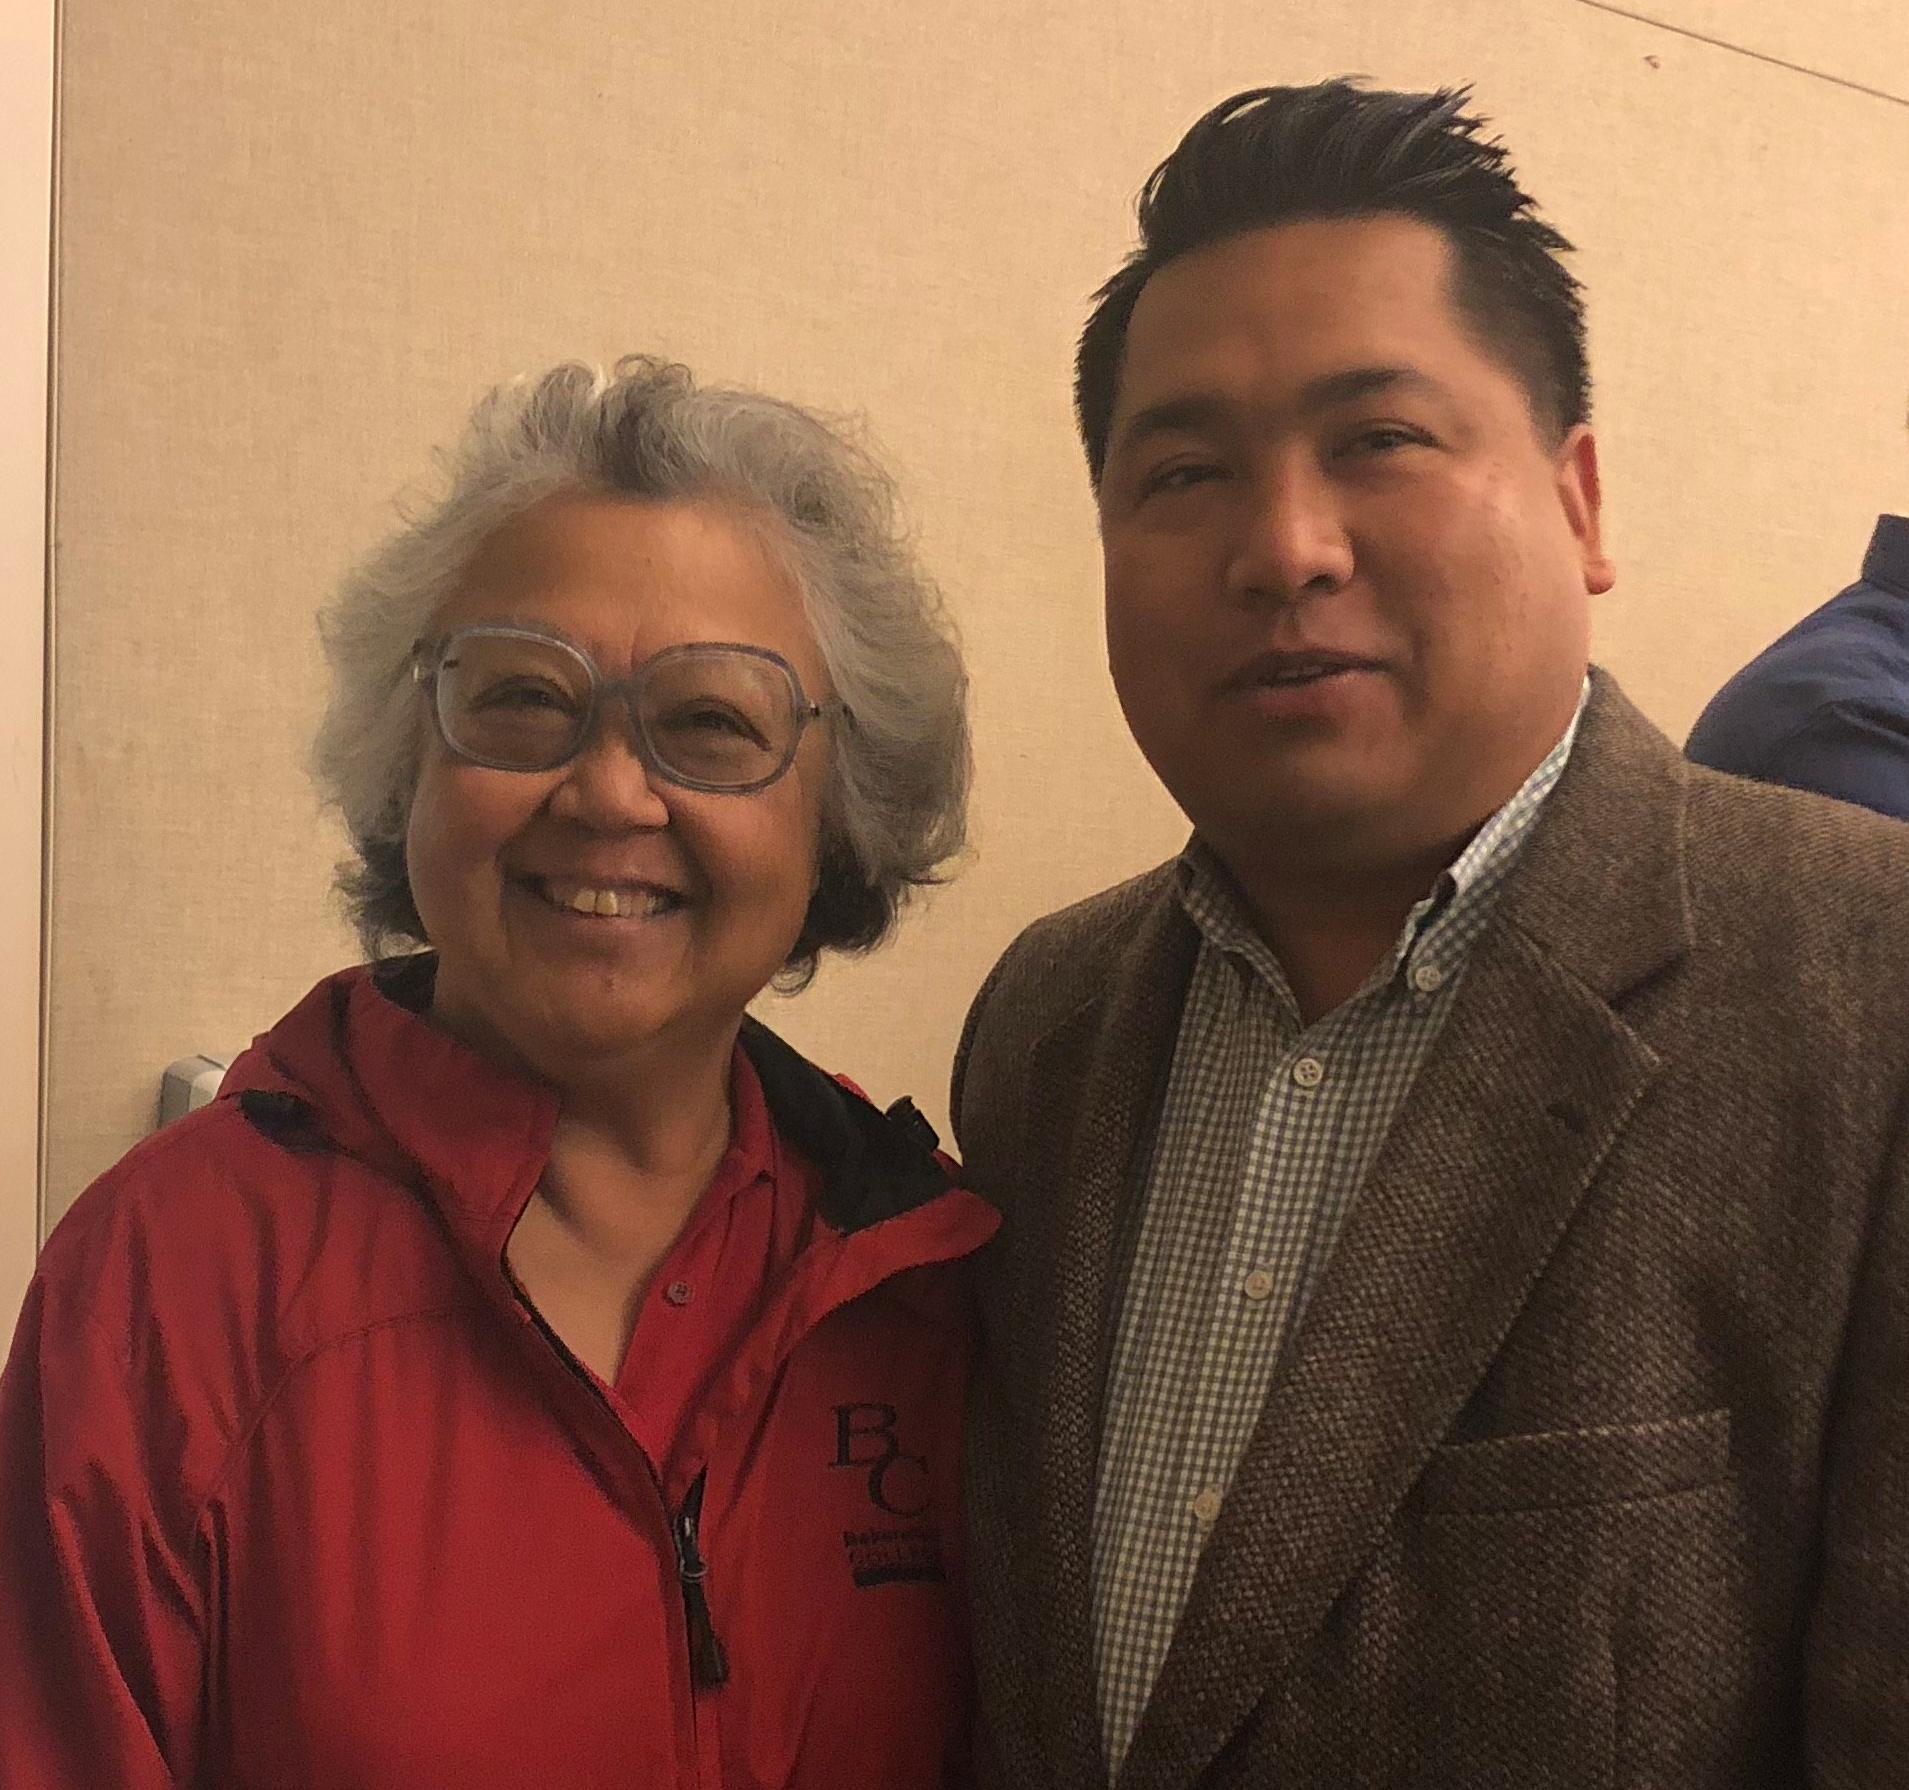 Helen Calip and Trustee Agbalog